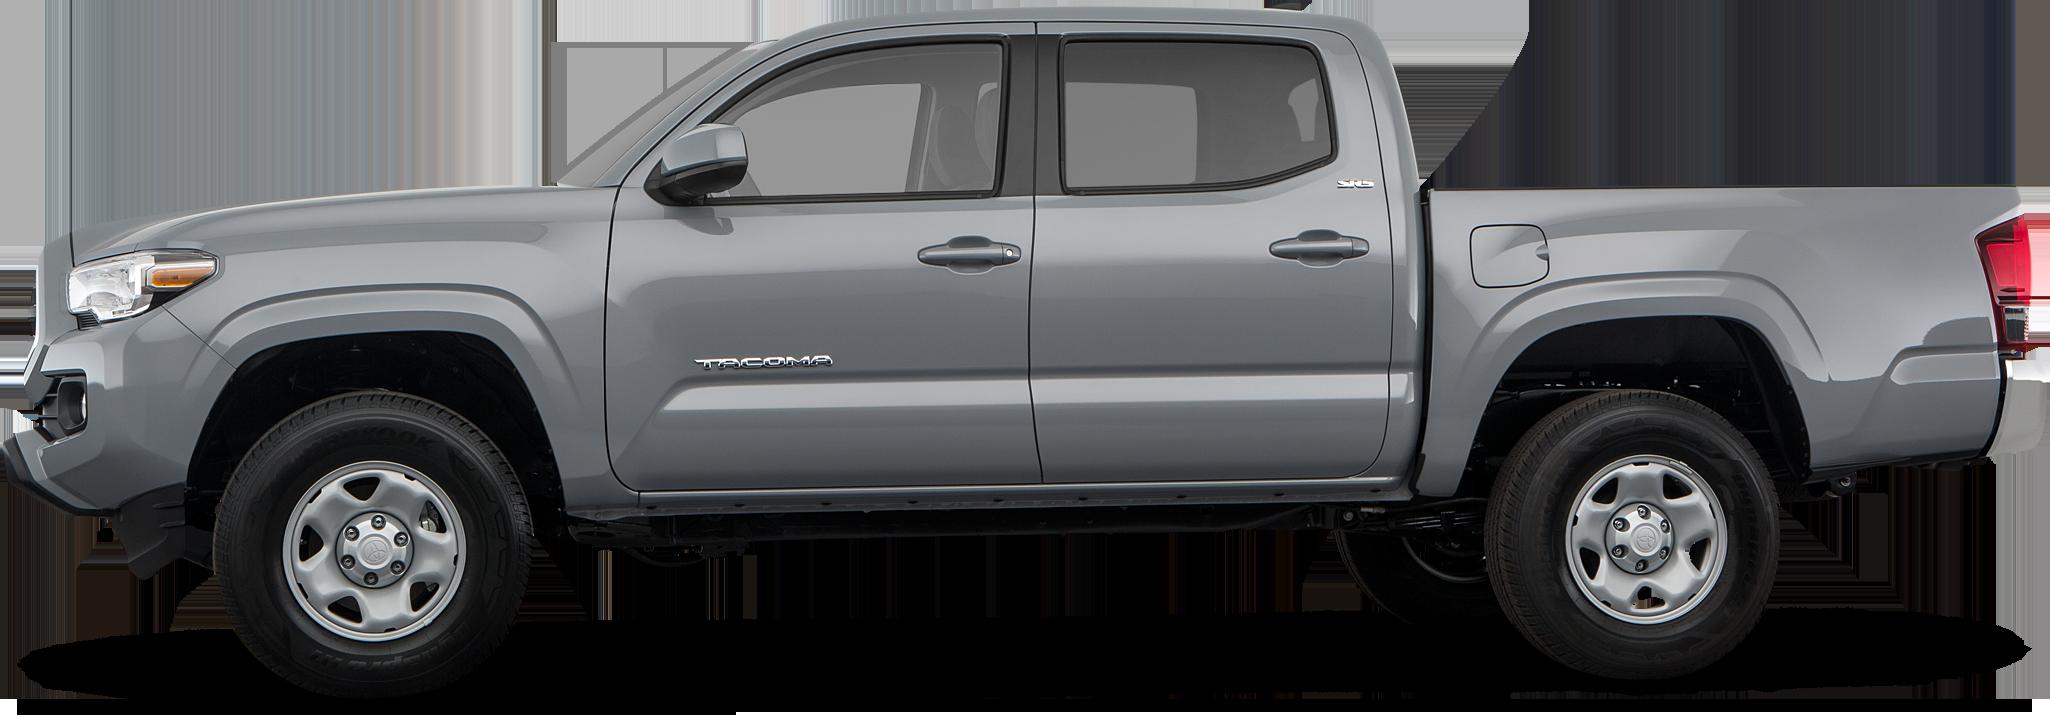 2019 Toyota Tacoma Truck SR5